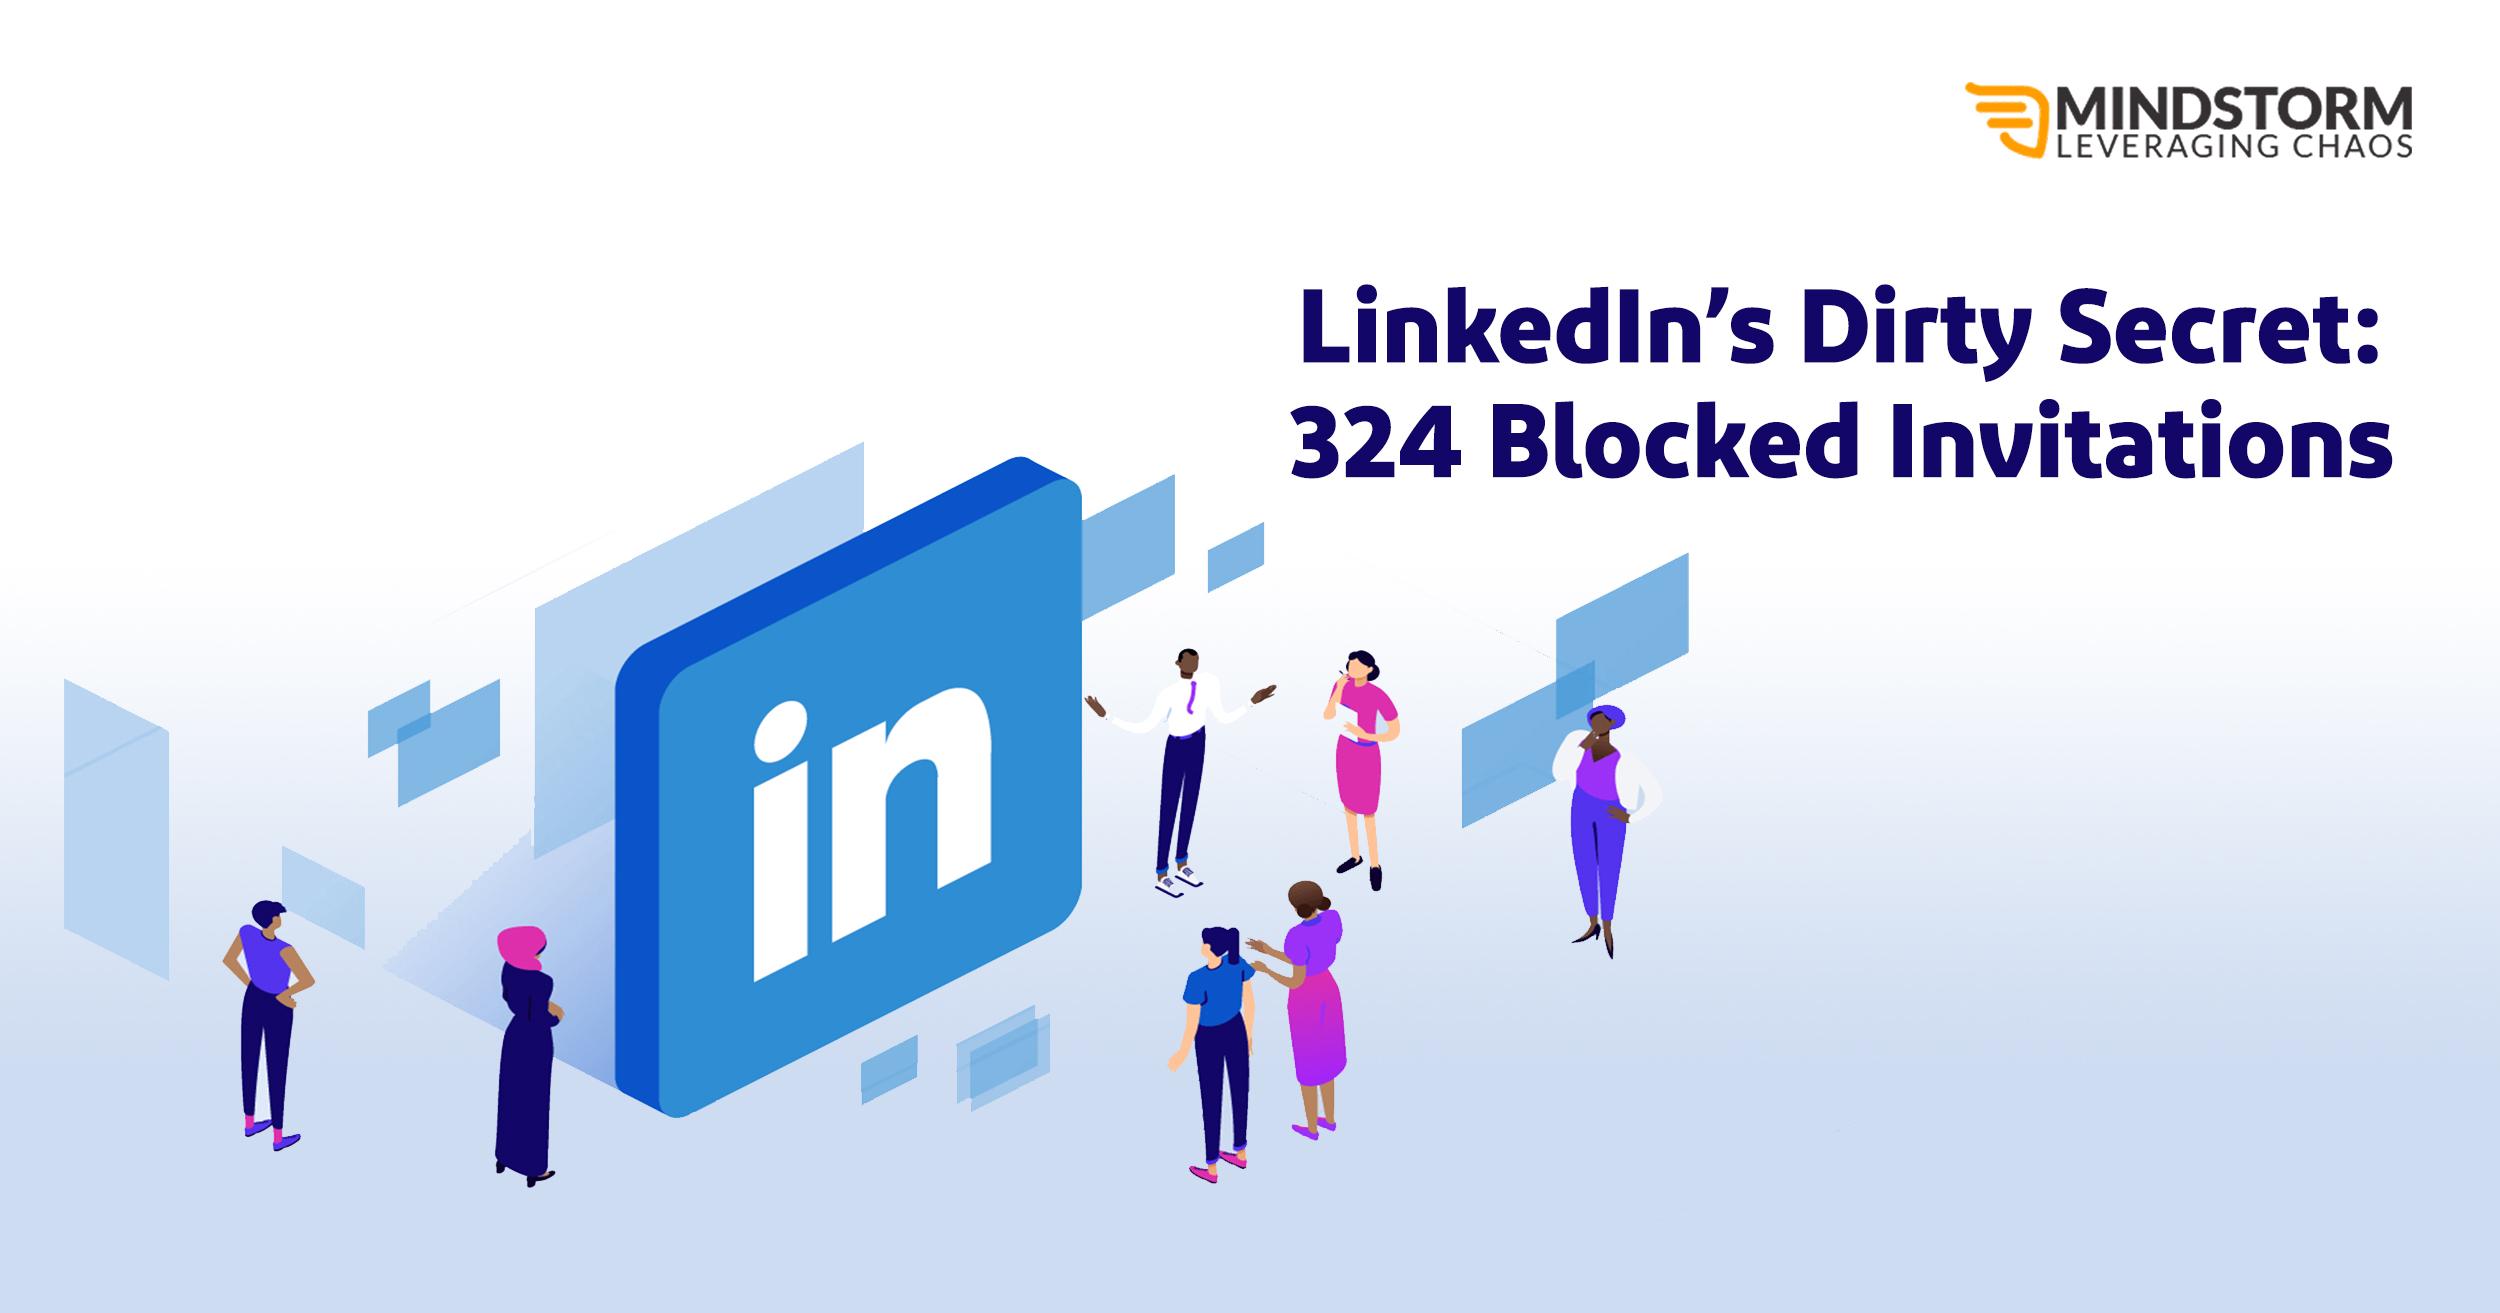 LinkedIn's Dirty Secret : 324 Blocked Invitations